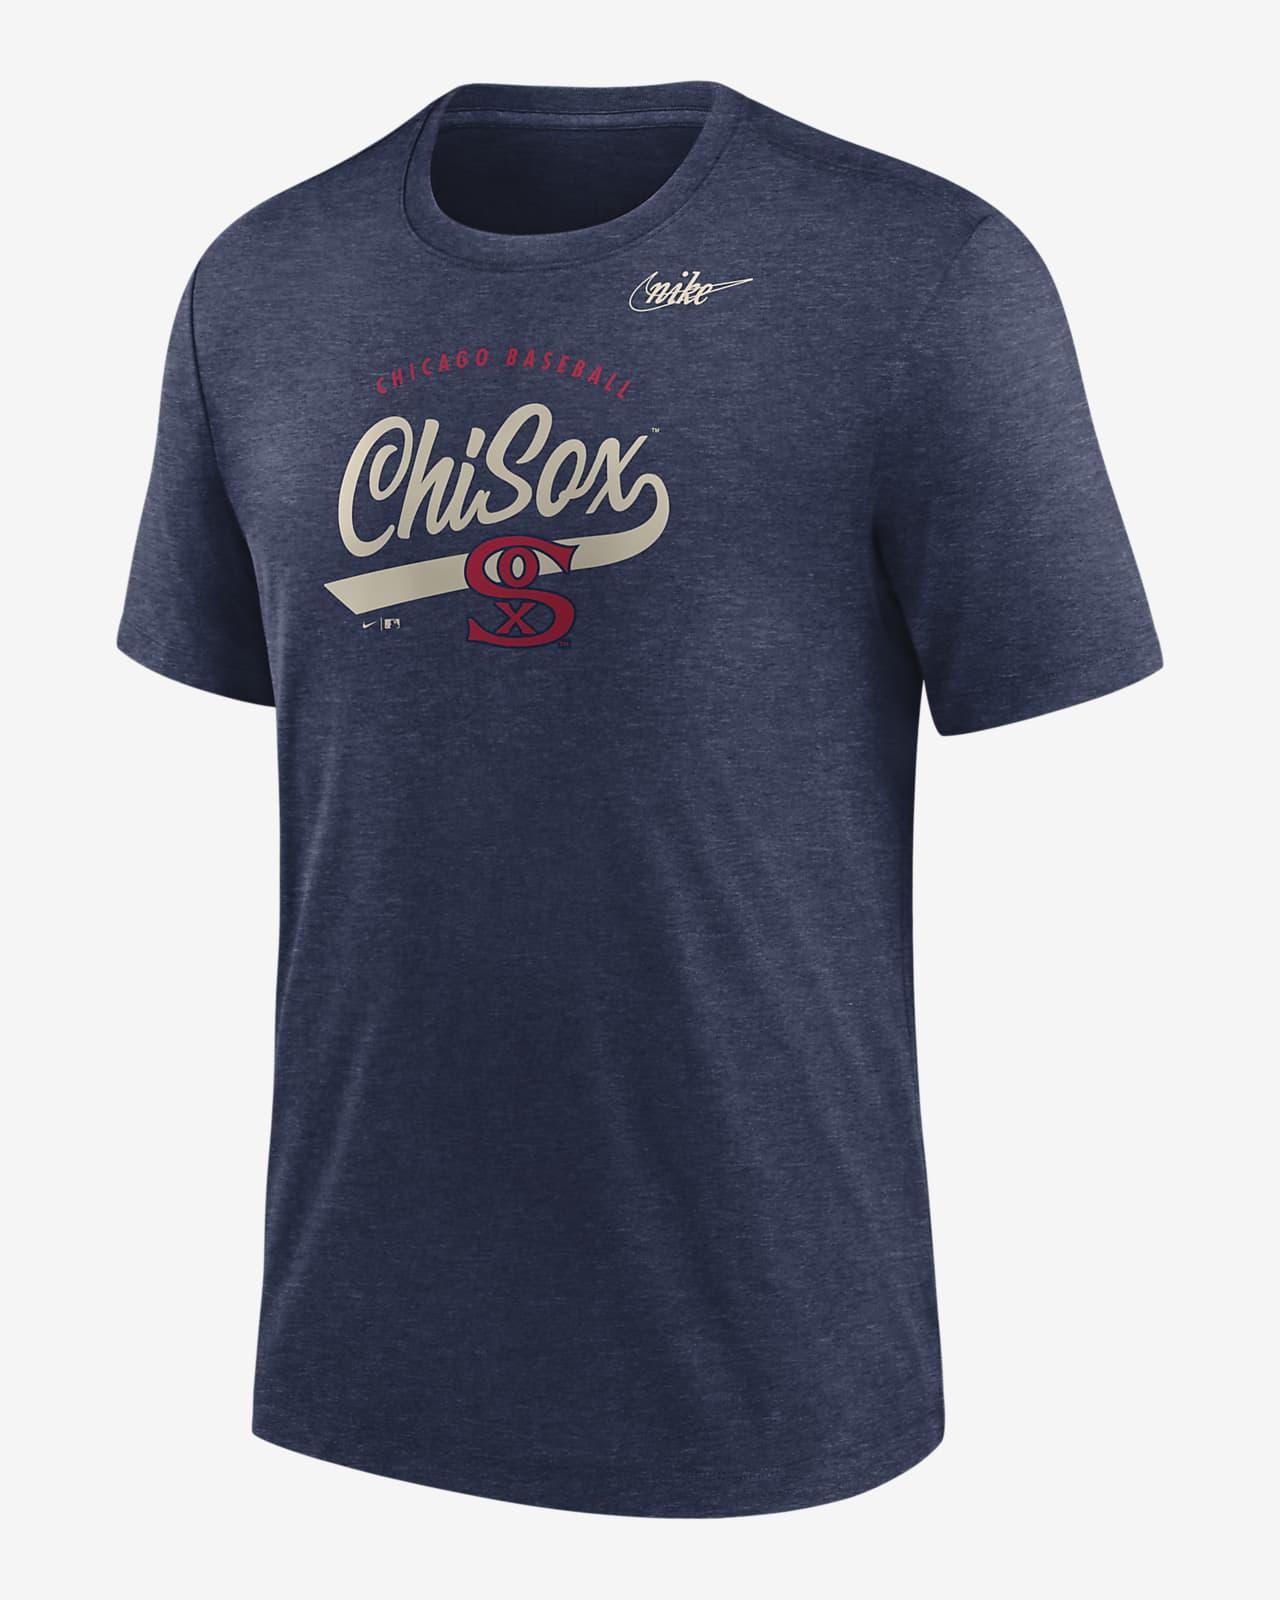 Nike Cooperstown Nickname (MLB Chicago White Sox) Men's T-Shirt